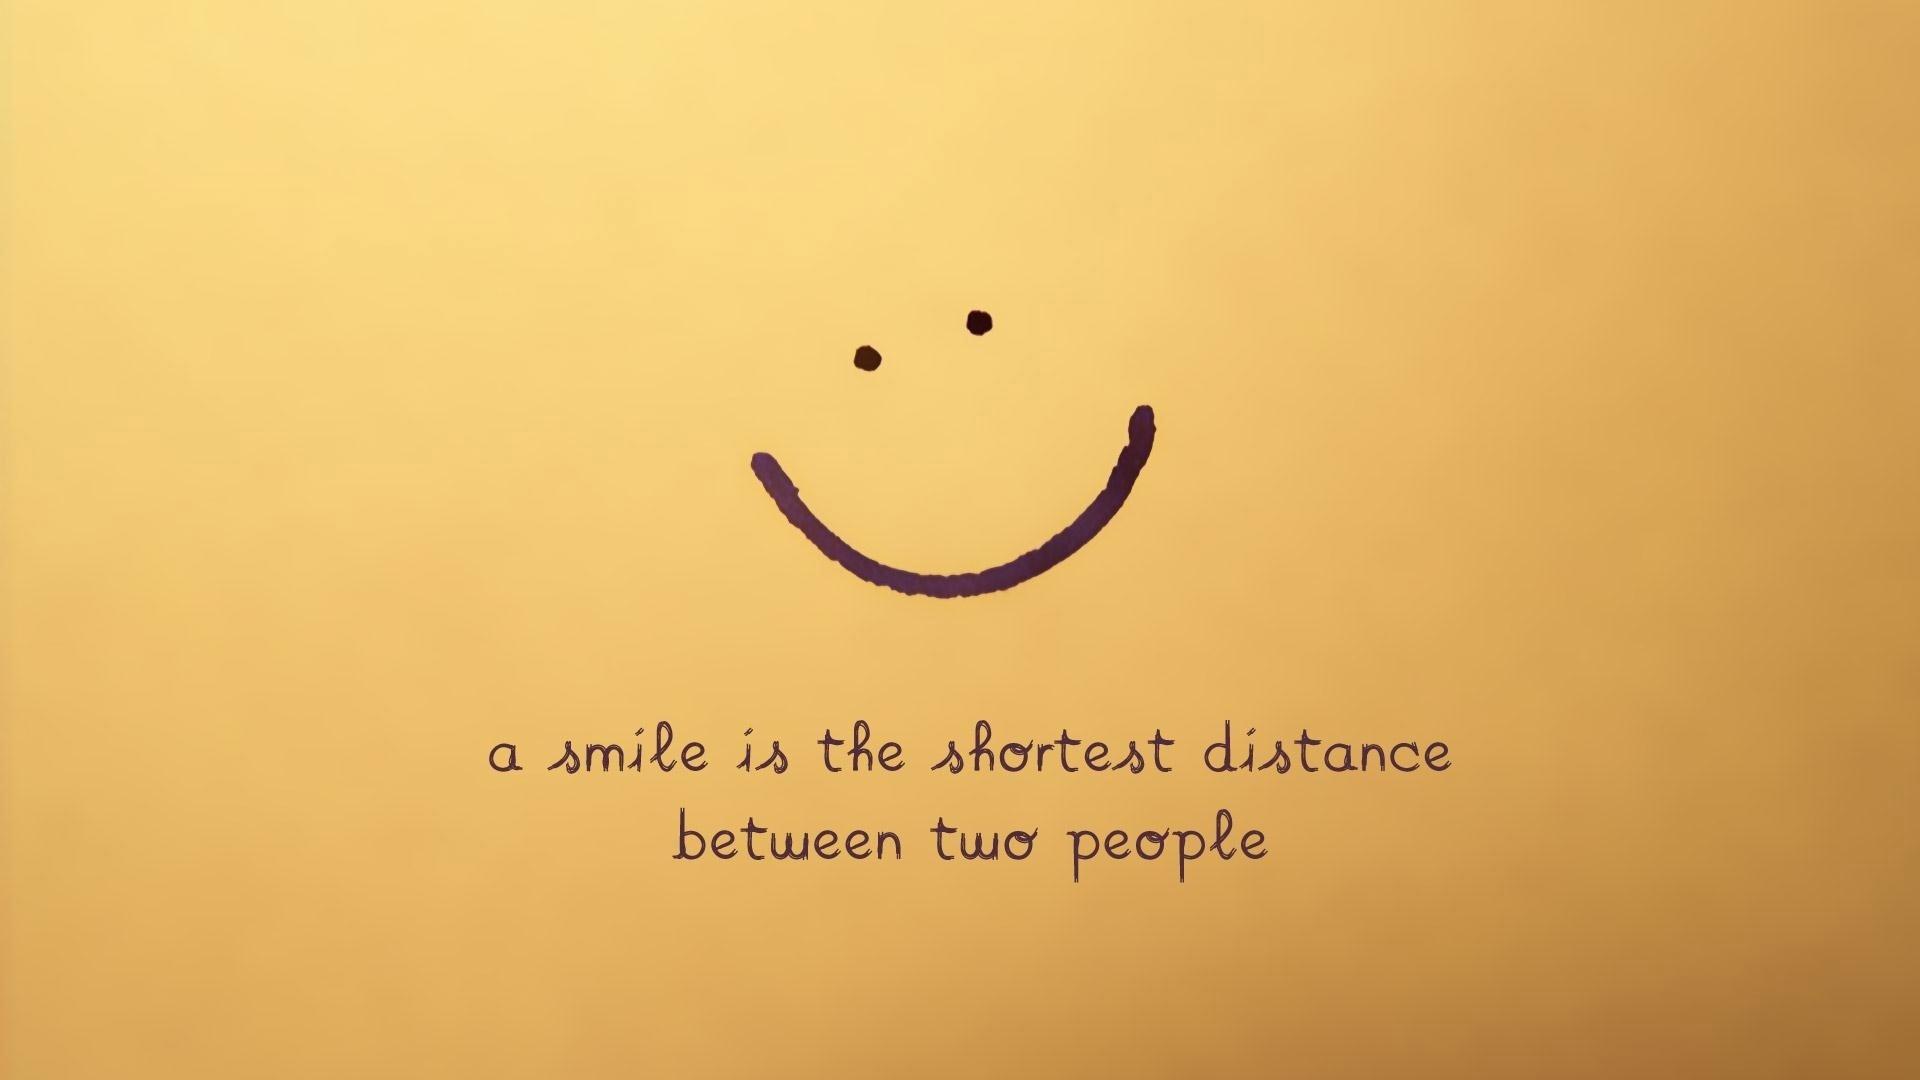 Beautiful Smile Wallpaper 68 Images